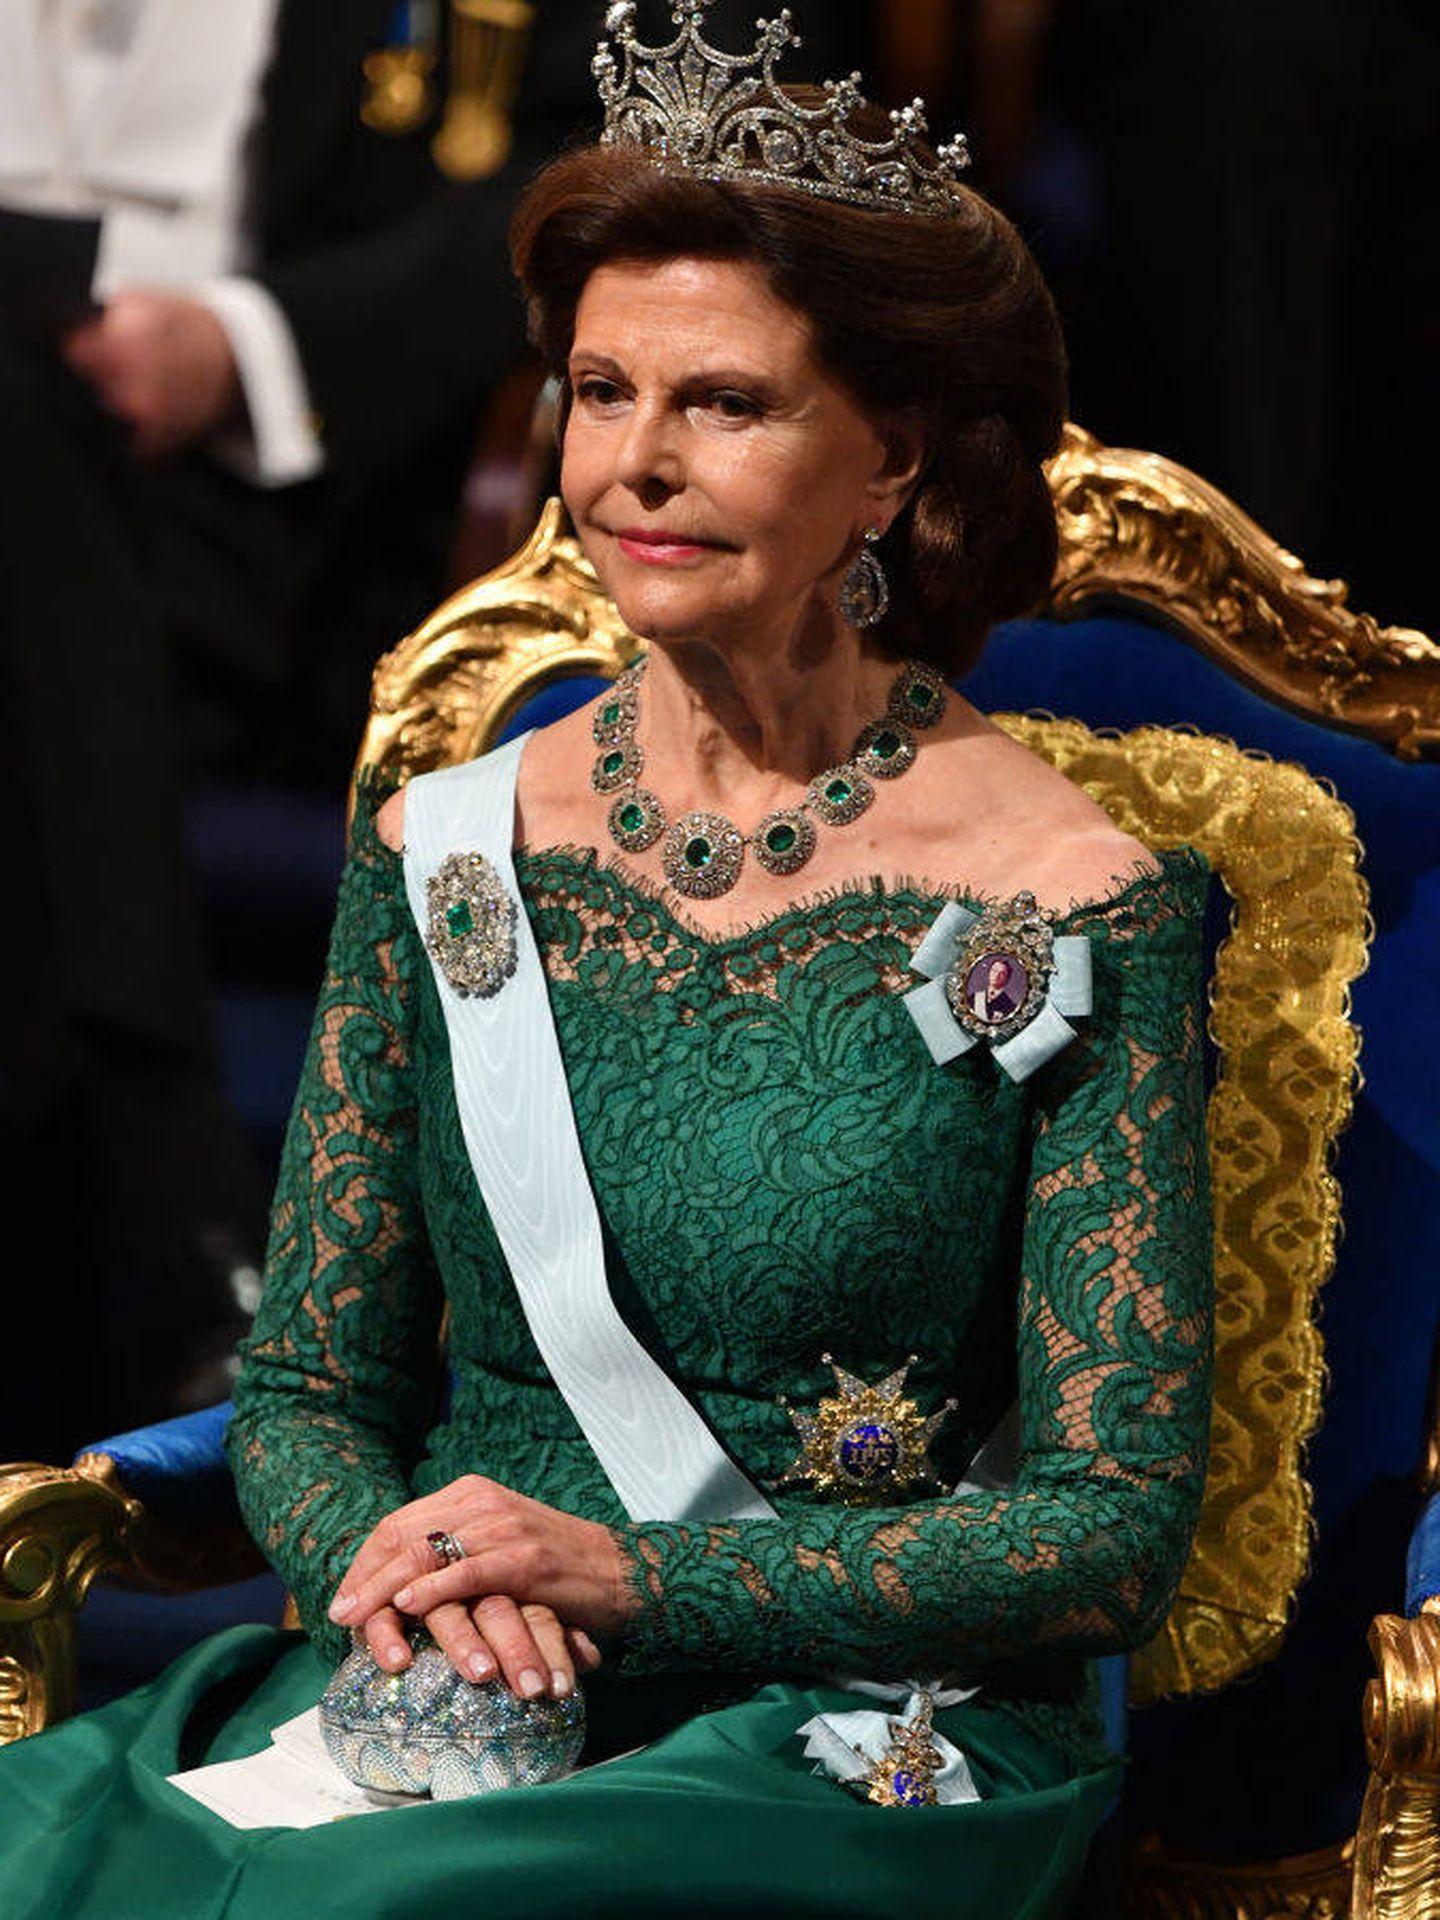 La reina Silvia. (Getty)